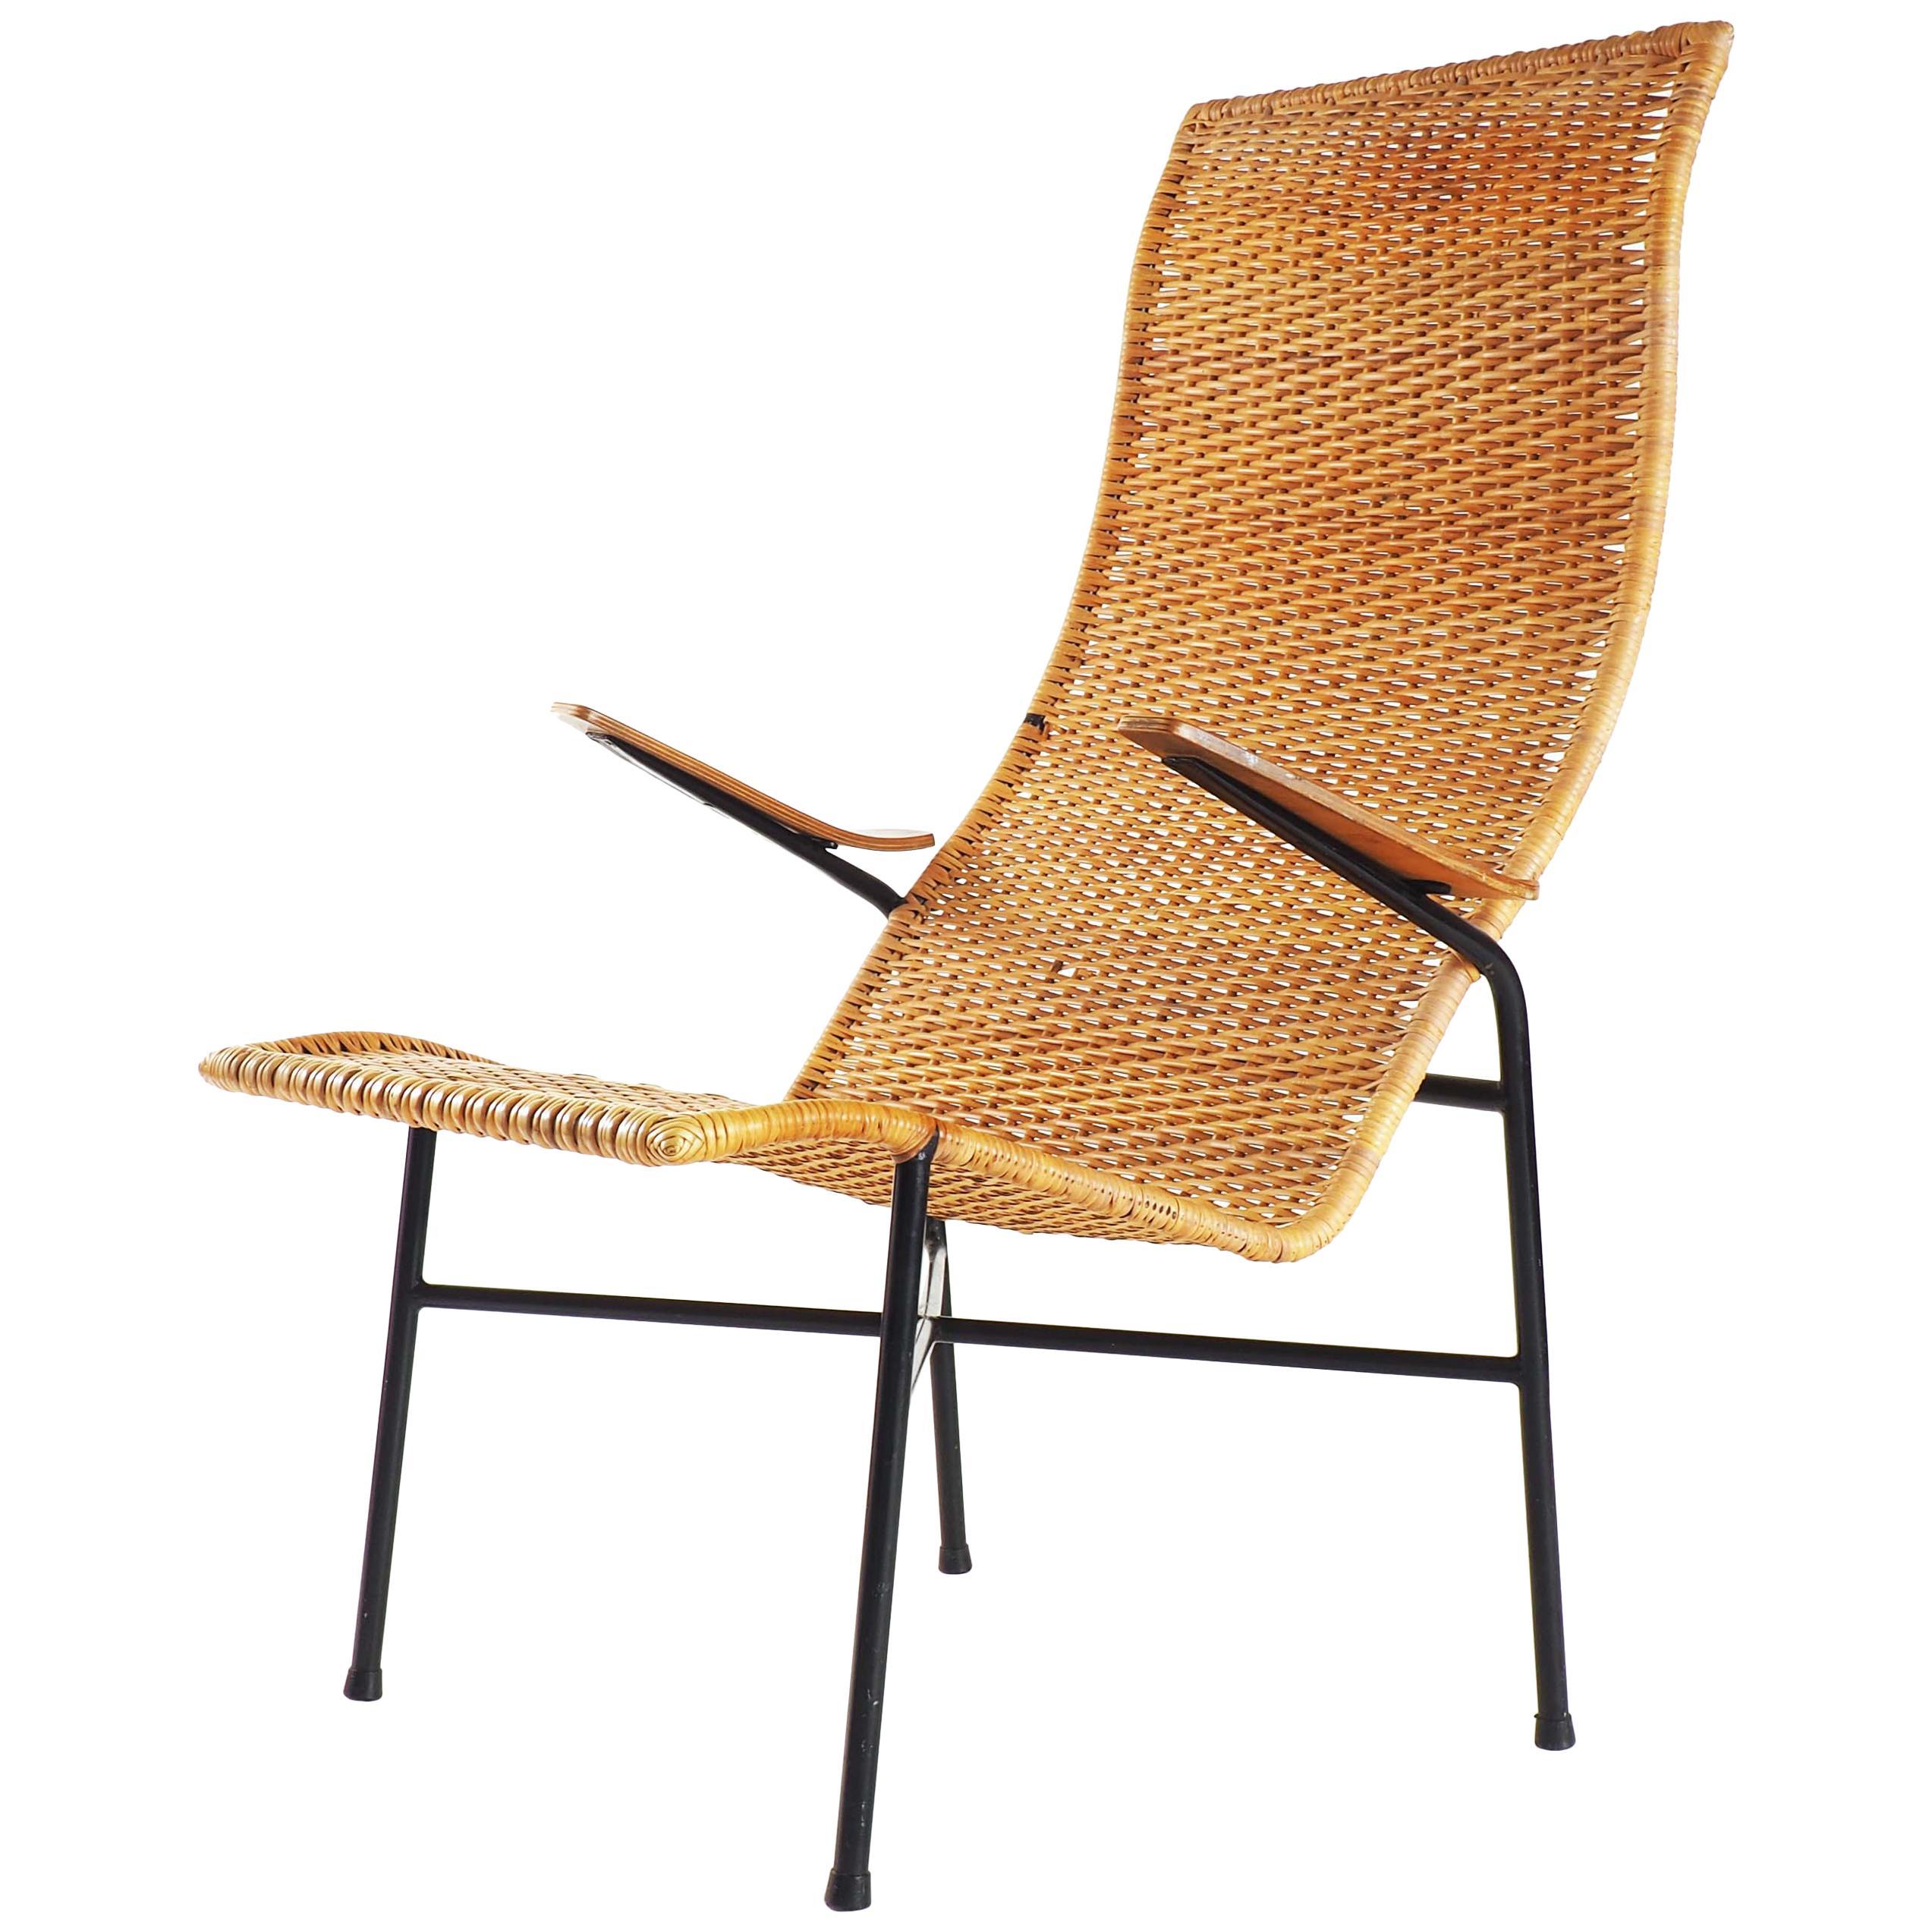 Lounge Chair in Rattan, Teak and Metal